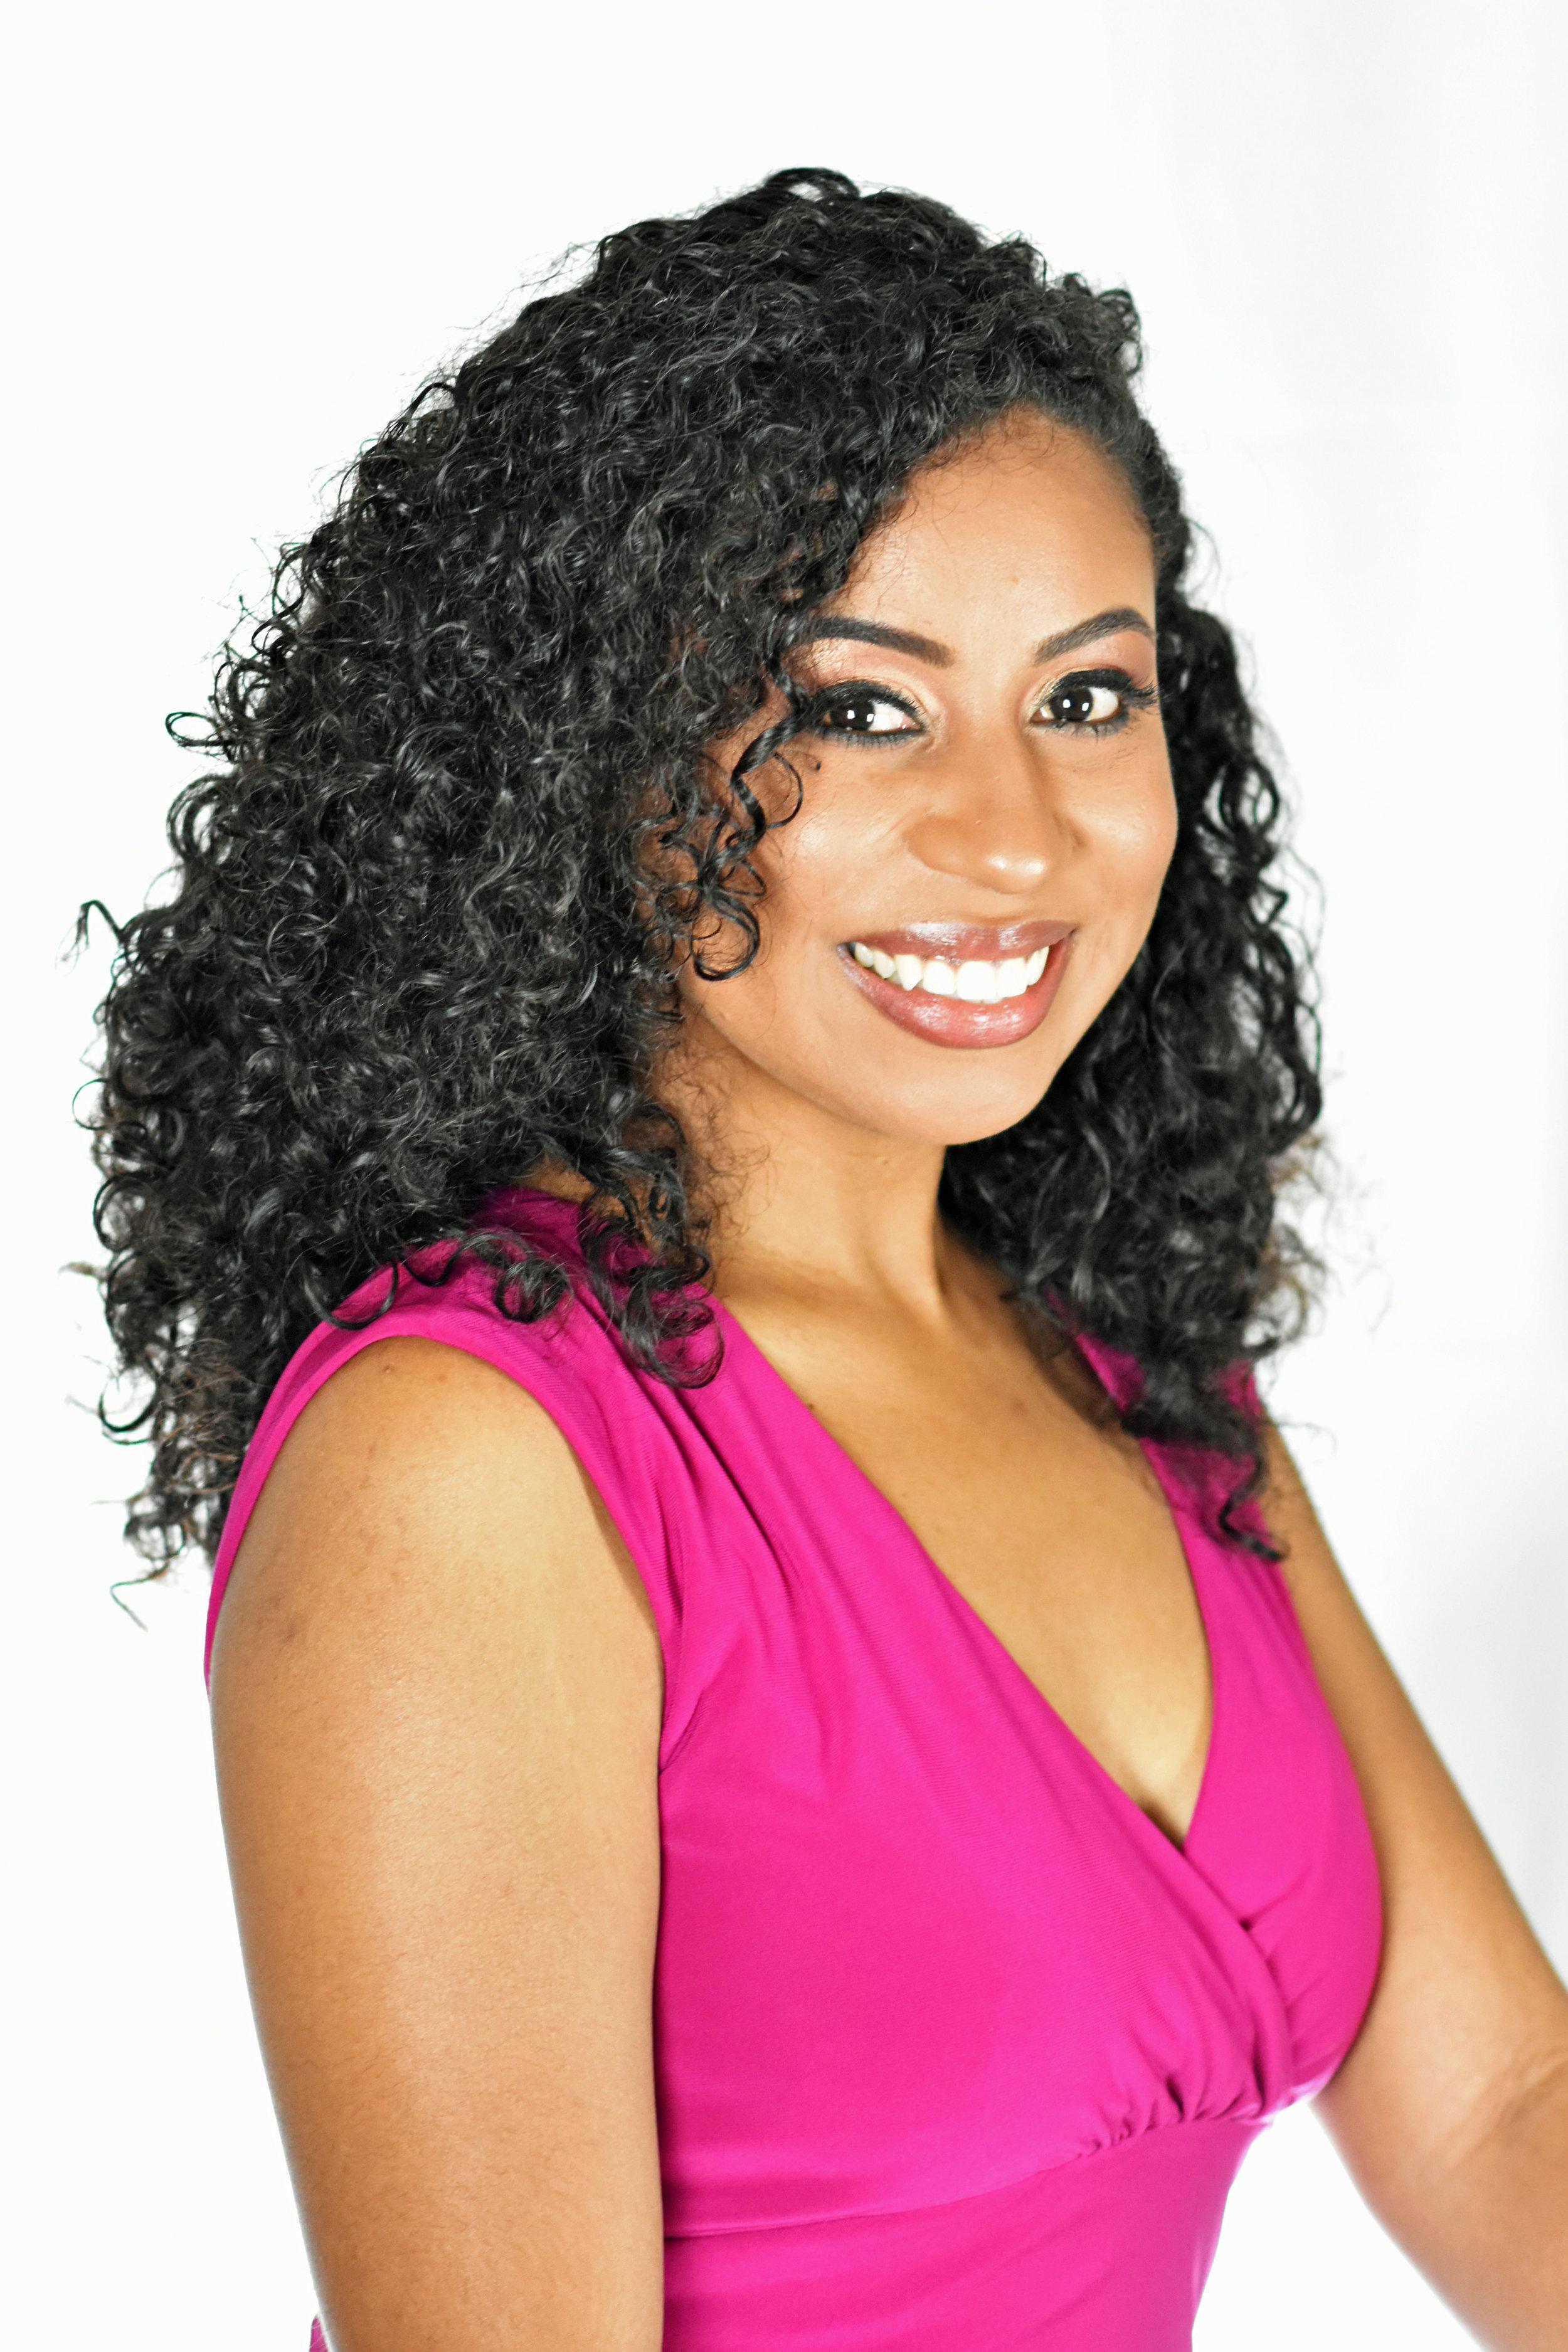 Miss Southwest Texas- Chantelle Lewis